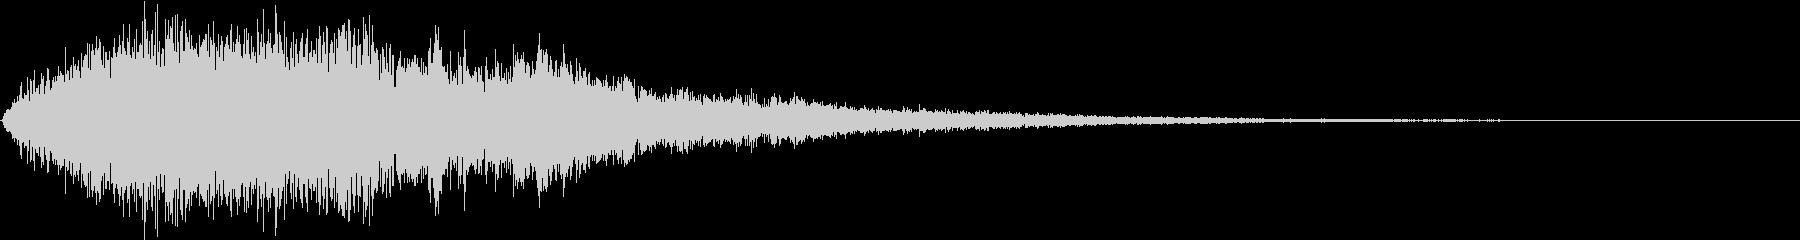 CINEMATIC BRAAMS_04の未再生の波形